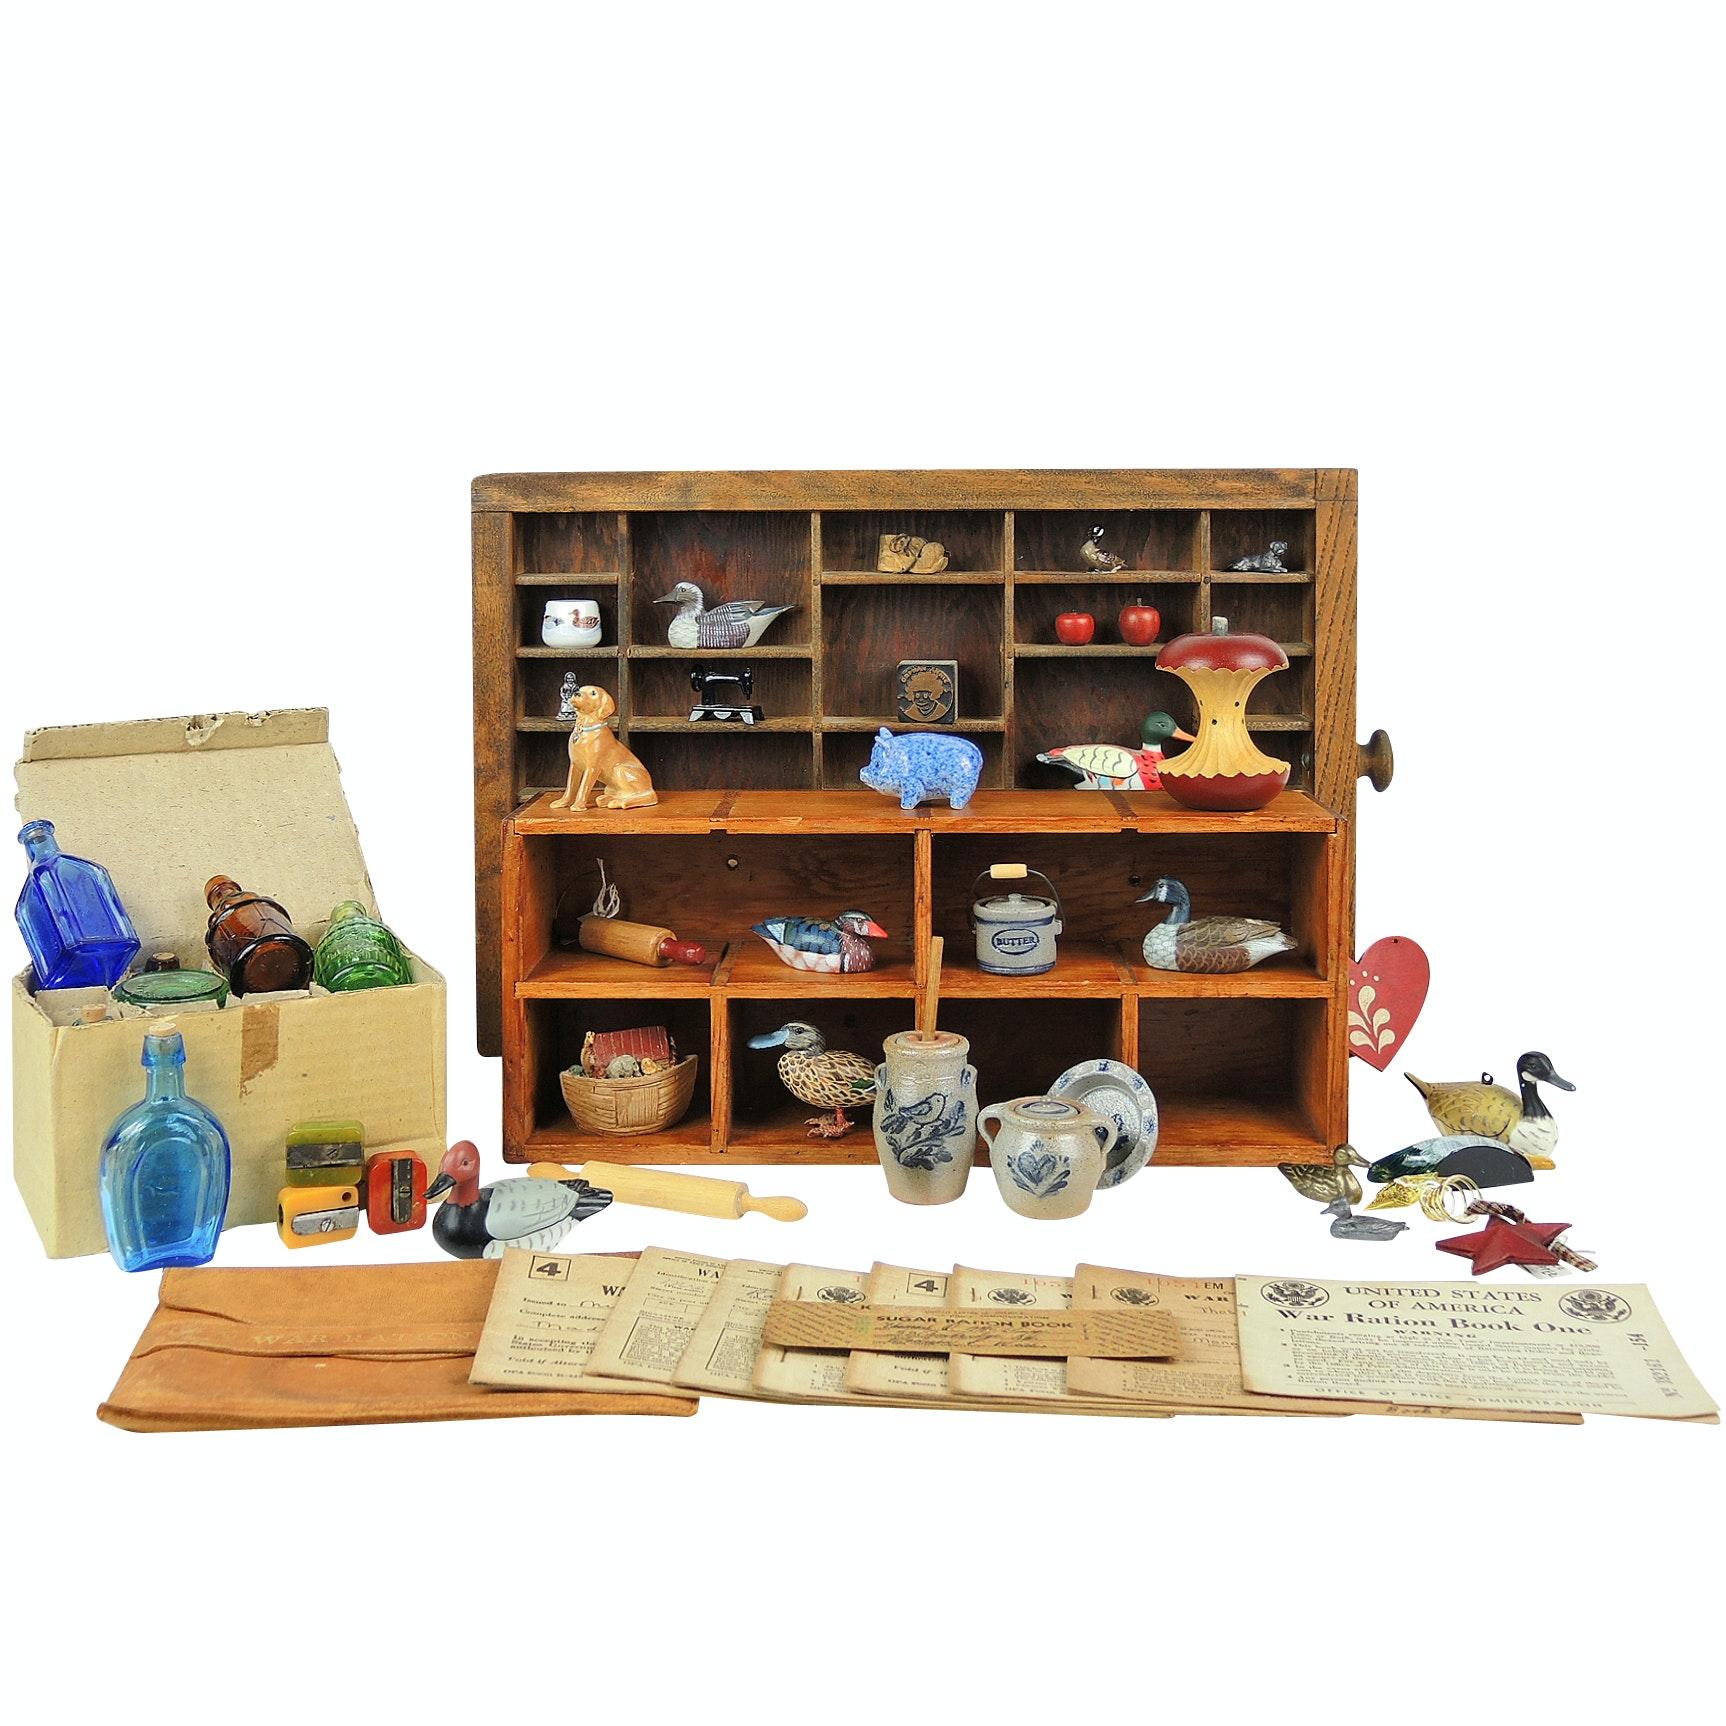 Miniatures, Type Set Box, Bakelite Pencil Sharpeners, World War ll Ration Books